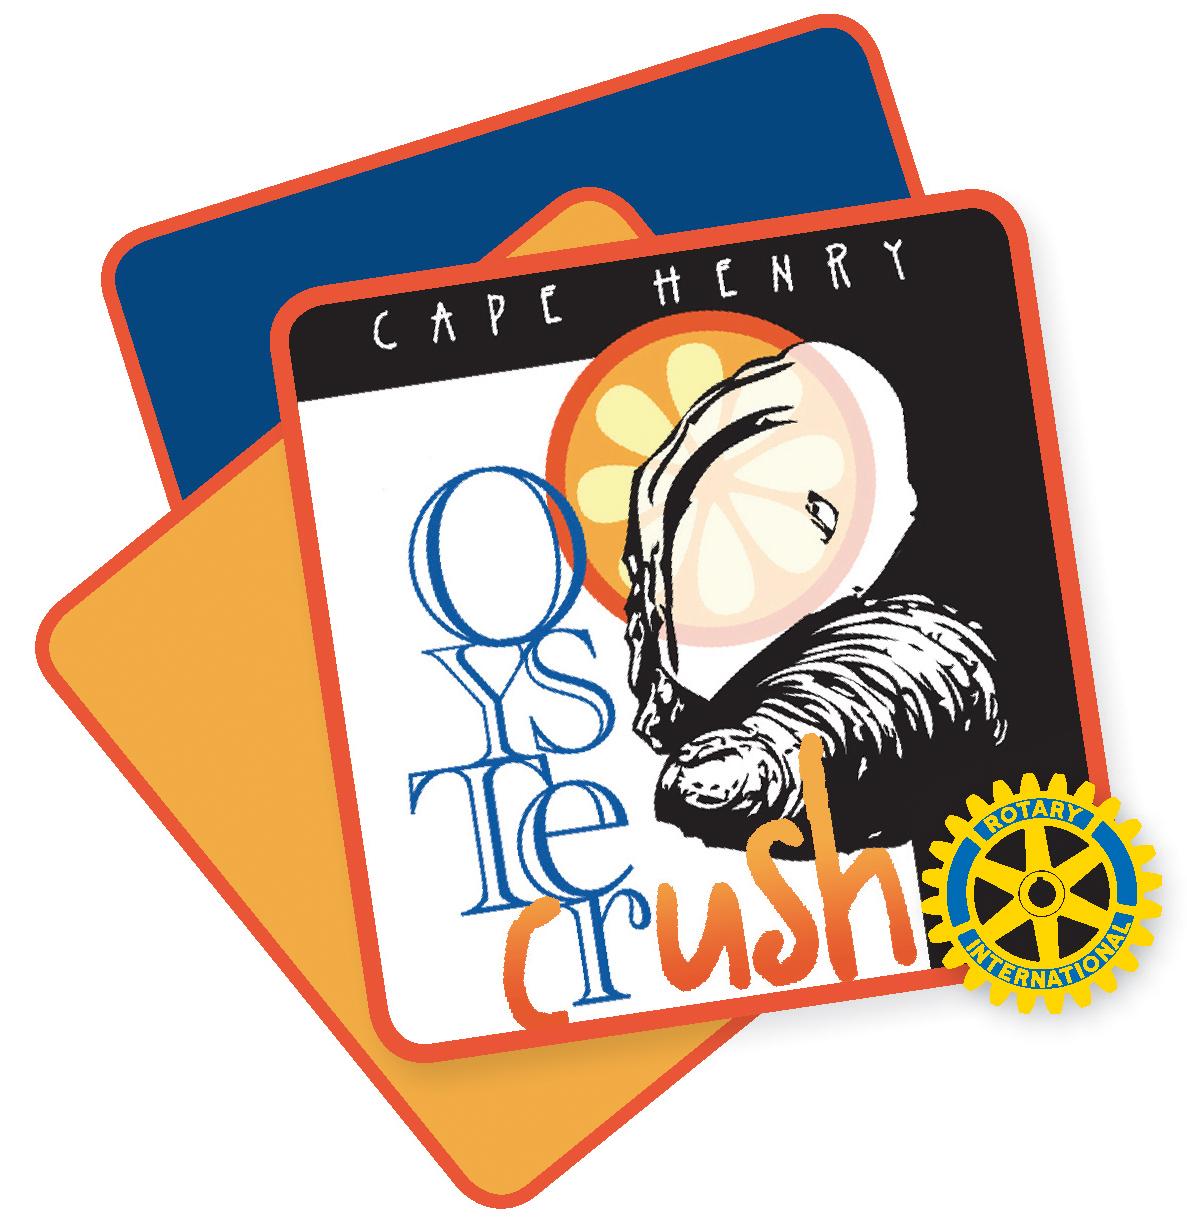 oyster-crush-charity-fundraiser.jpg